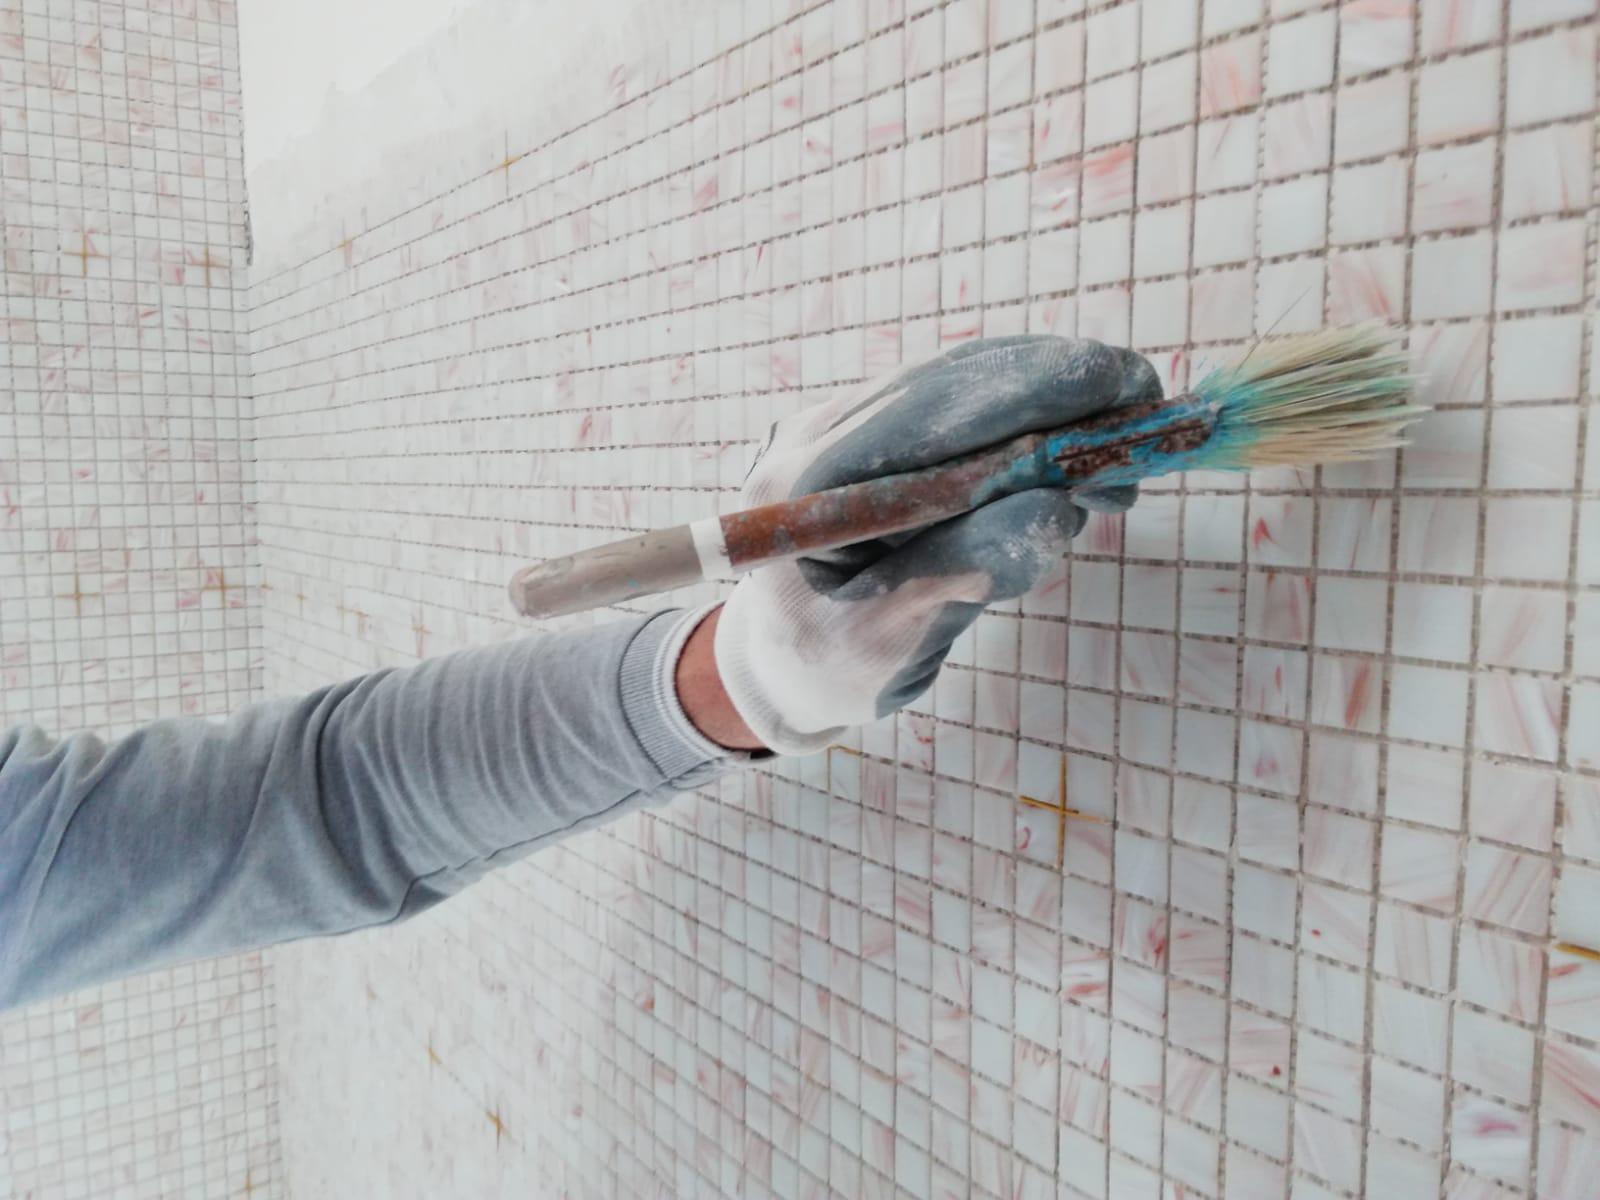 restauri-civili-industriali-edilizi-latina-mosaico